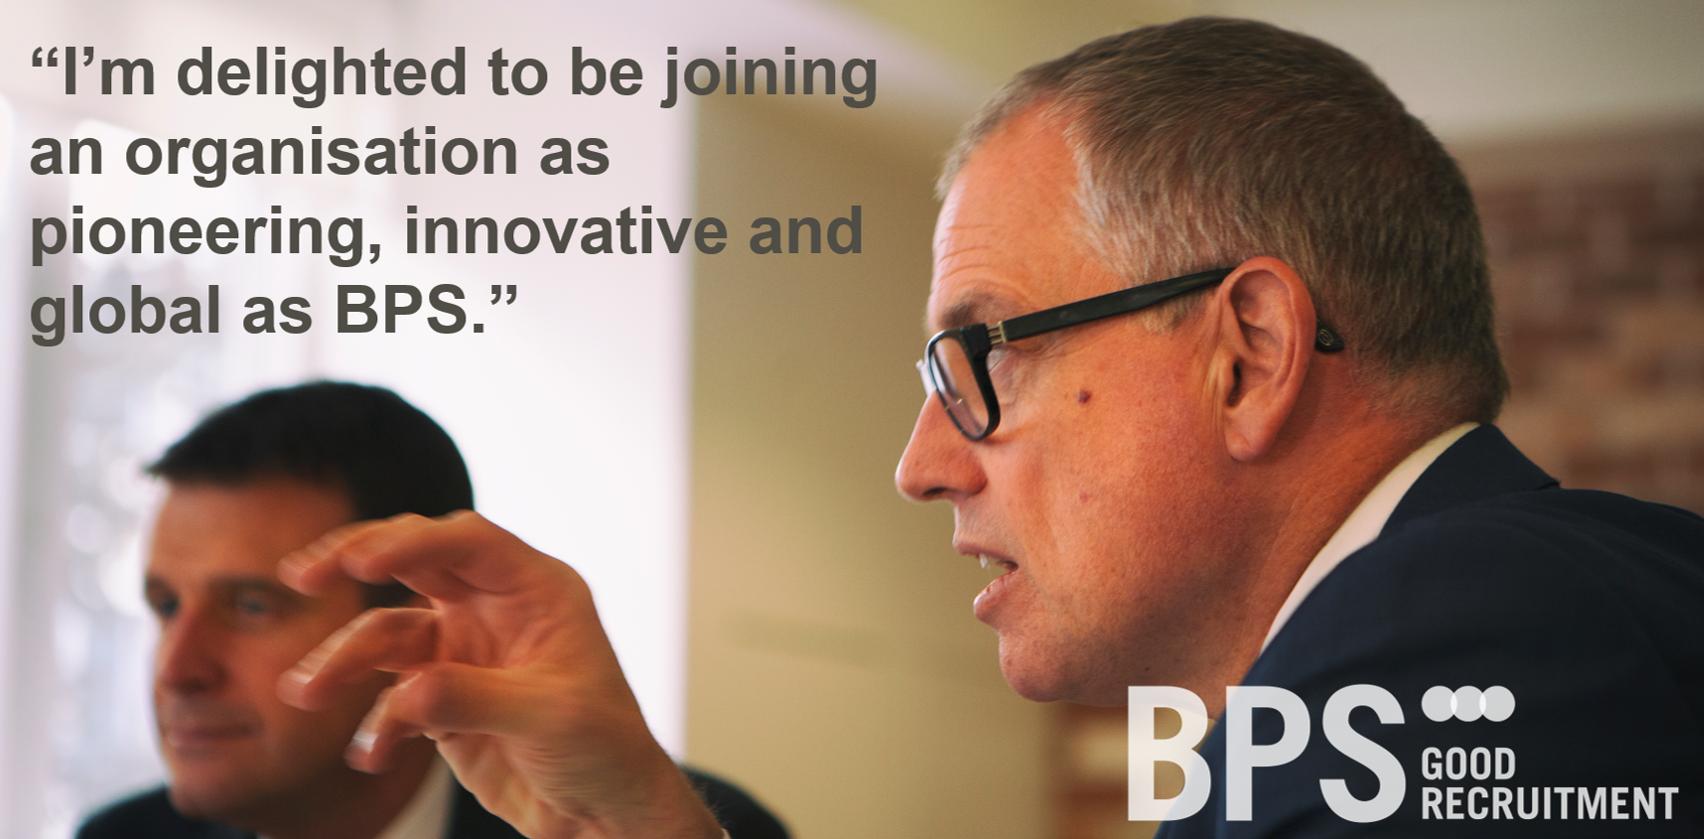 Kevin Green joins BPS World as non-executive director